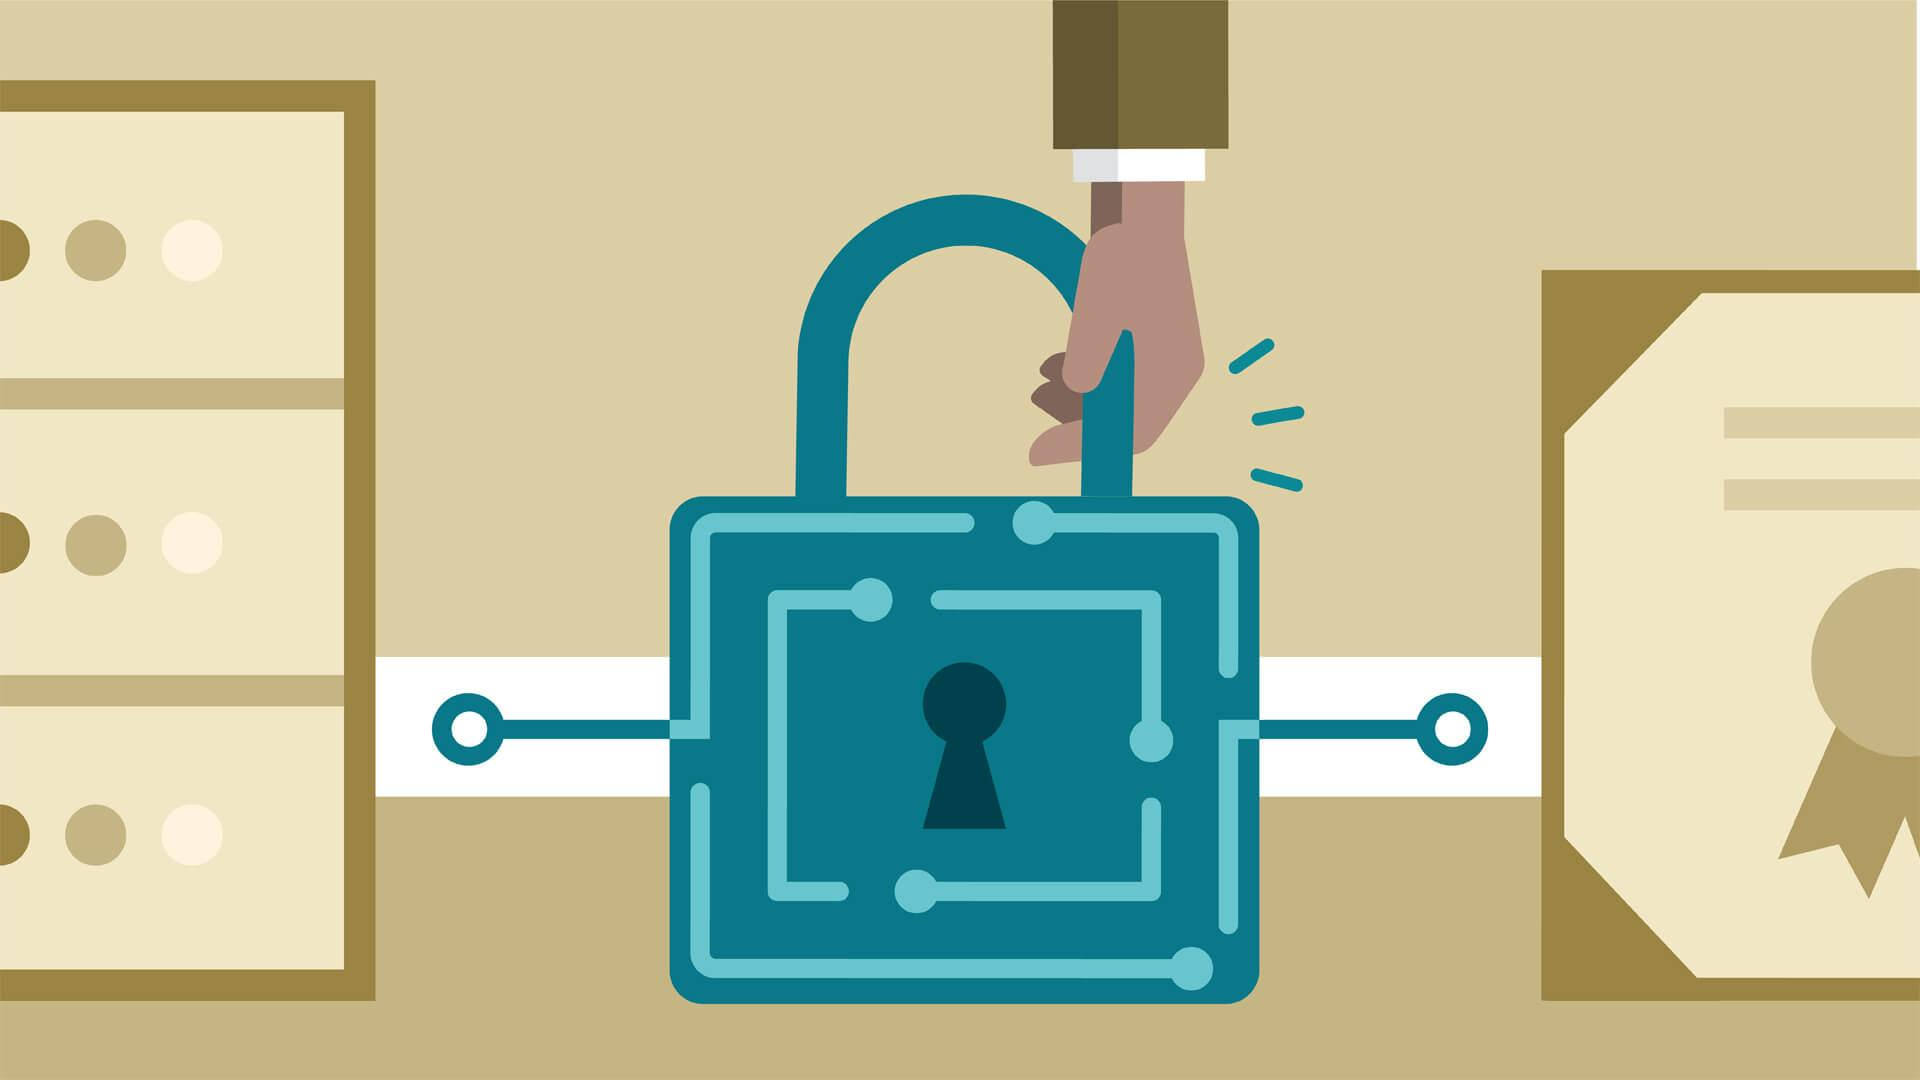 PKI for identity documents